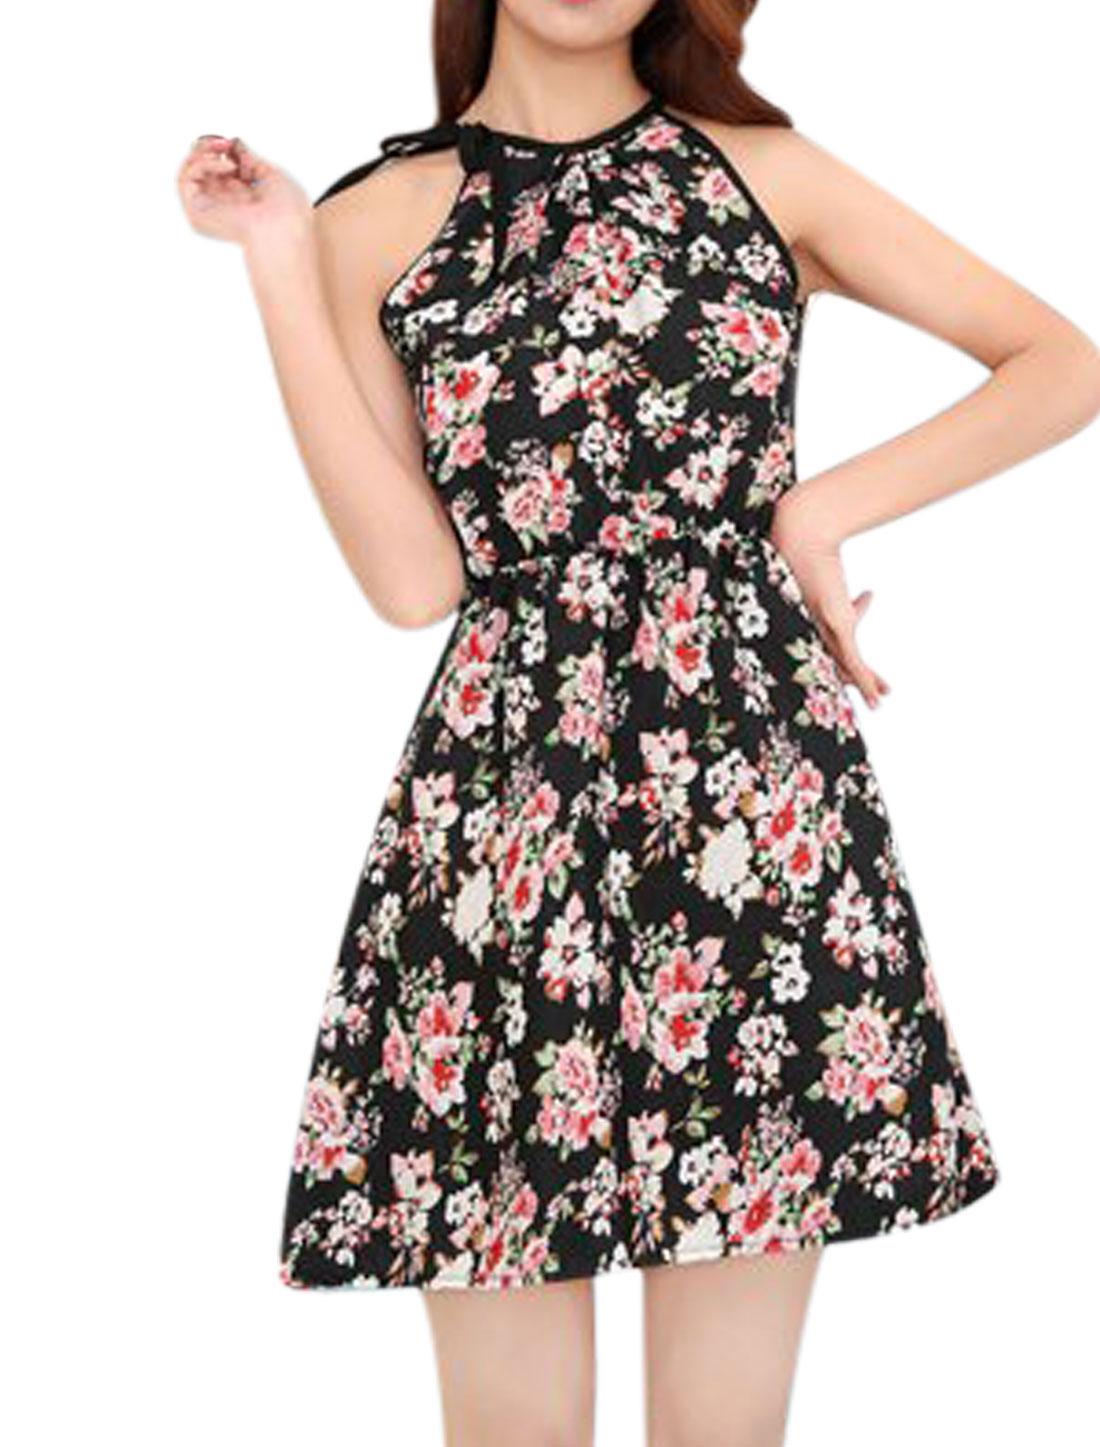 Ladies Halter Neck Sleeveless Elastic Waist Floral Prints Sundress Black XS